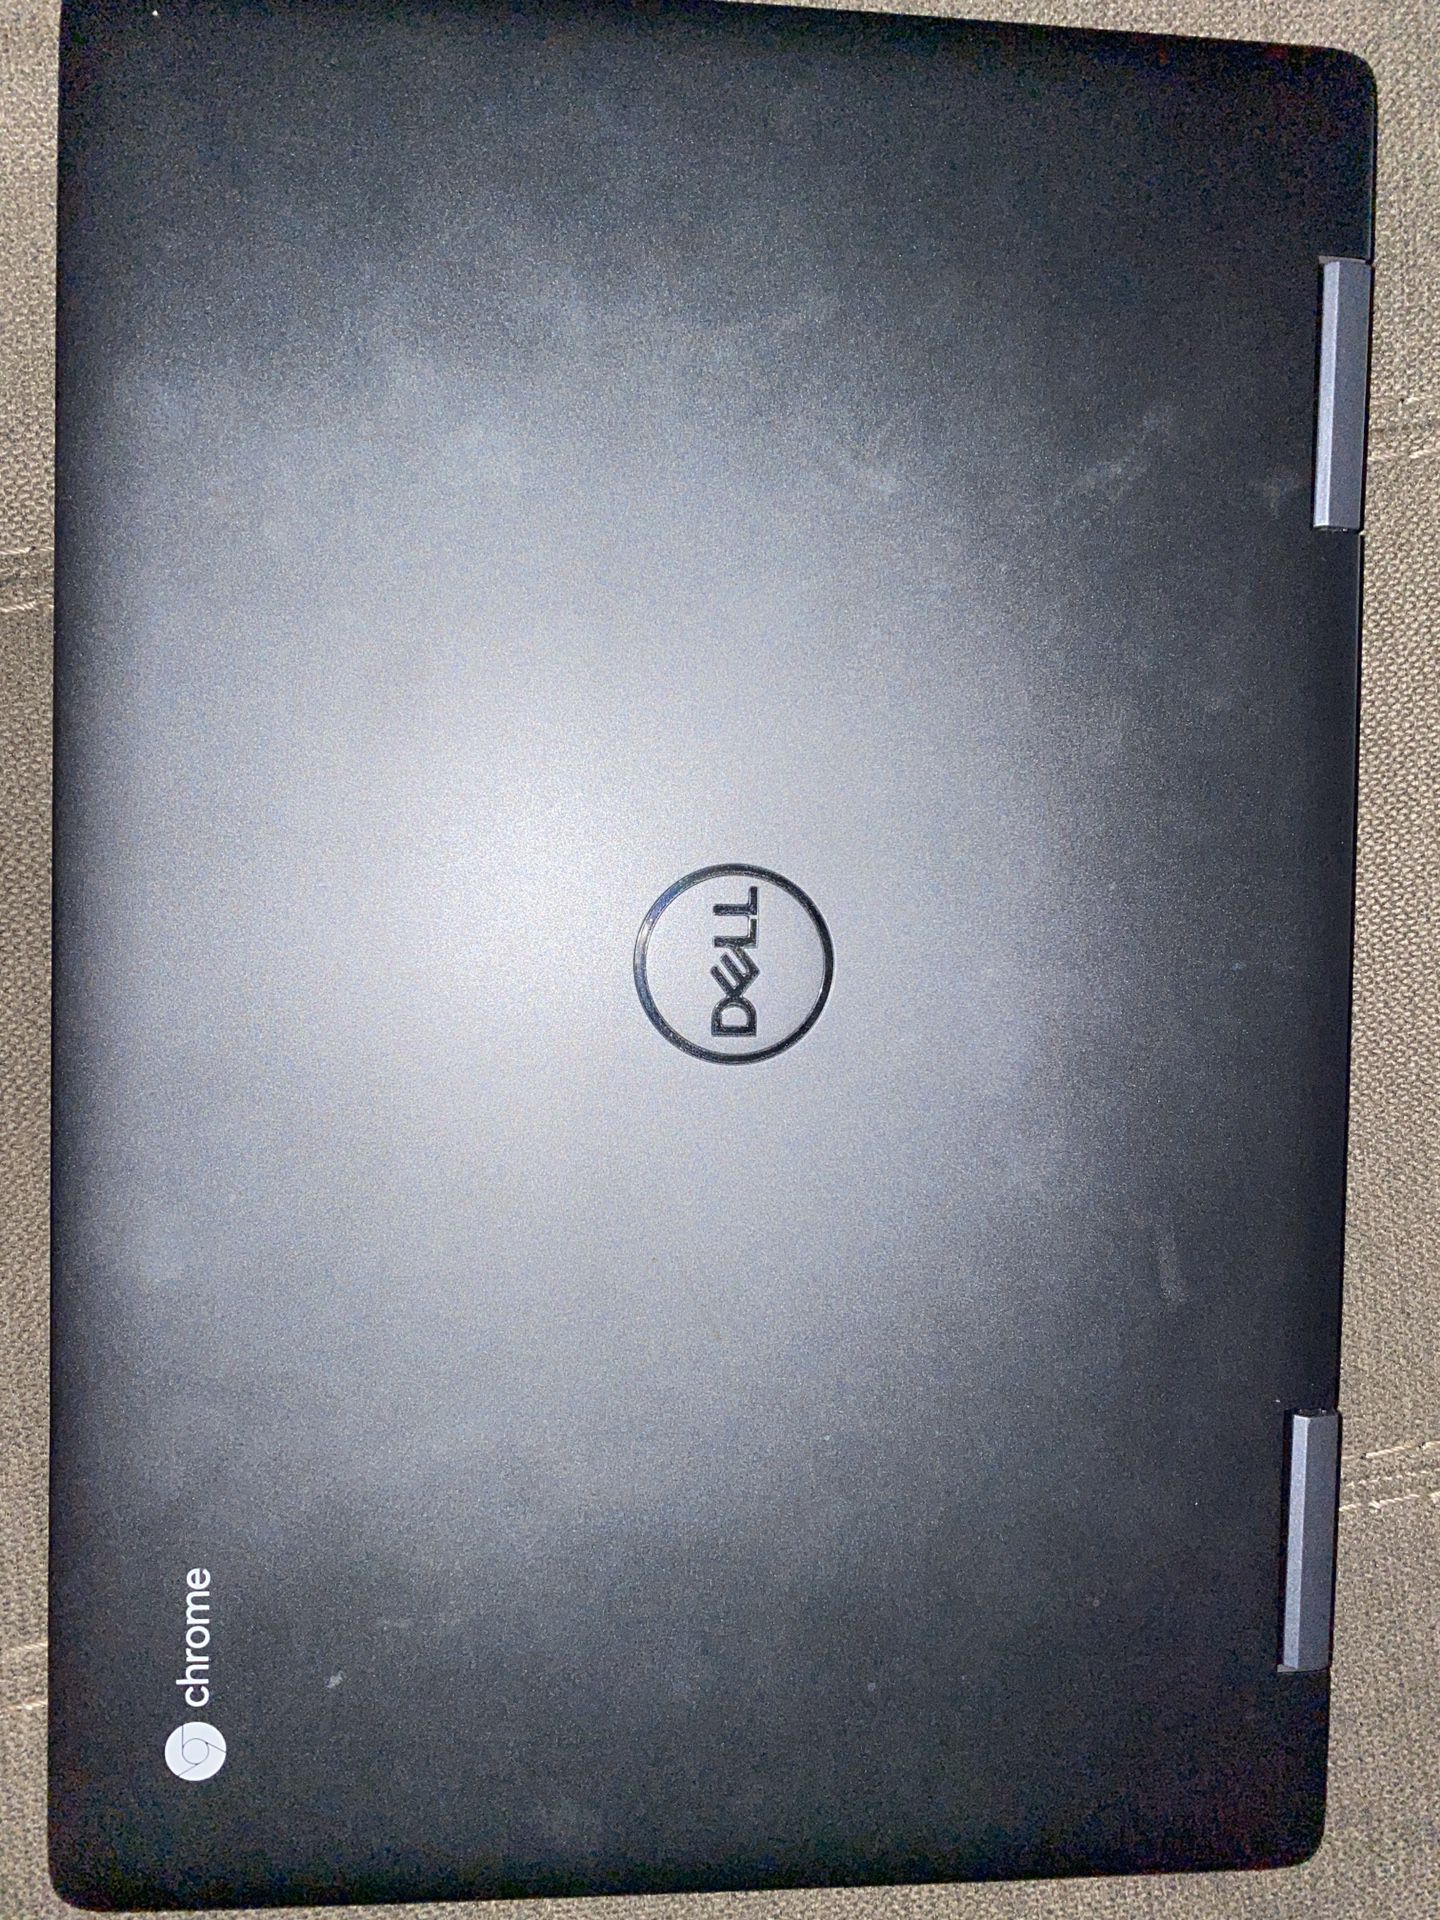 Dell - Touchscreen Chromebook